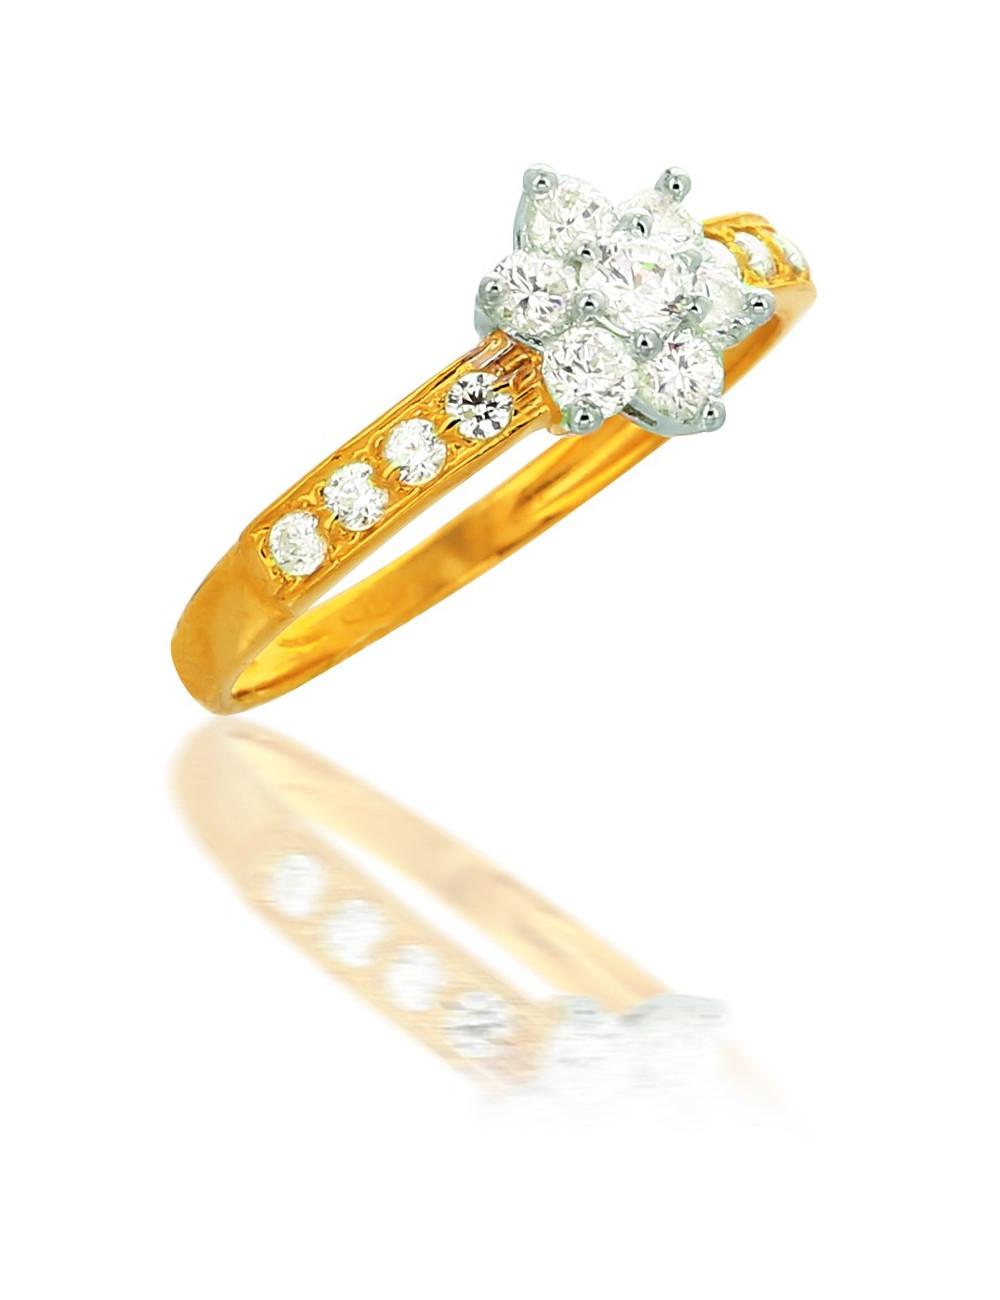 Bague Fleur Zircon Or 18 carats